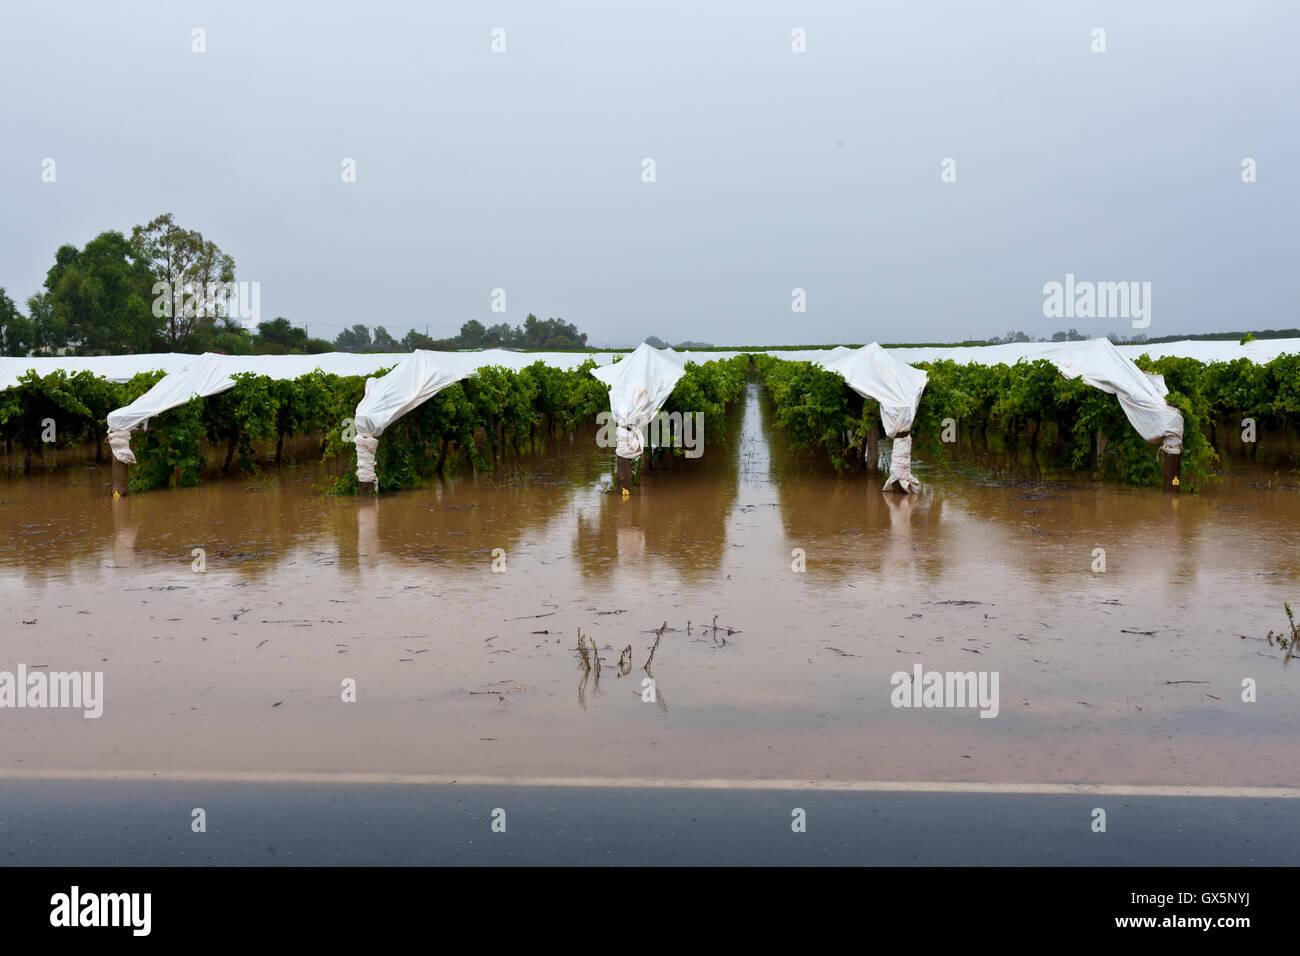 Unseasonal heavy rains cause flooding in low lying vineyards, Mildura, February 2011. - Stock Image